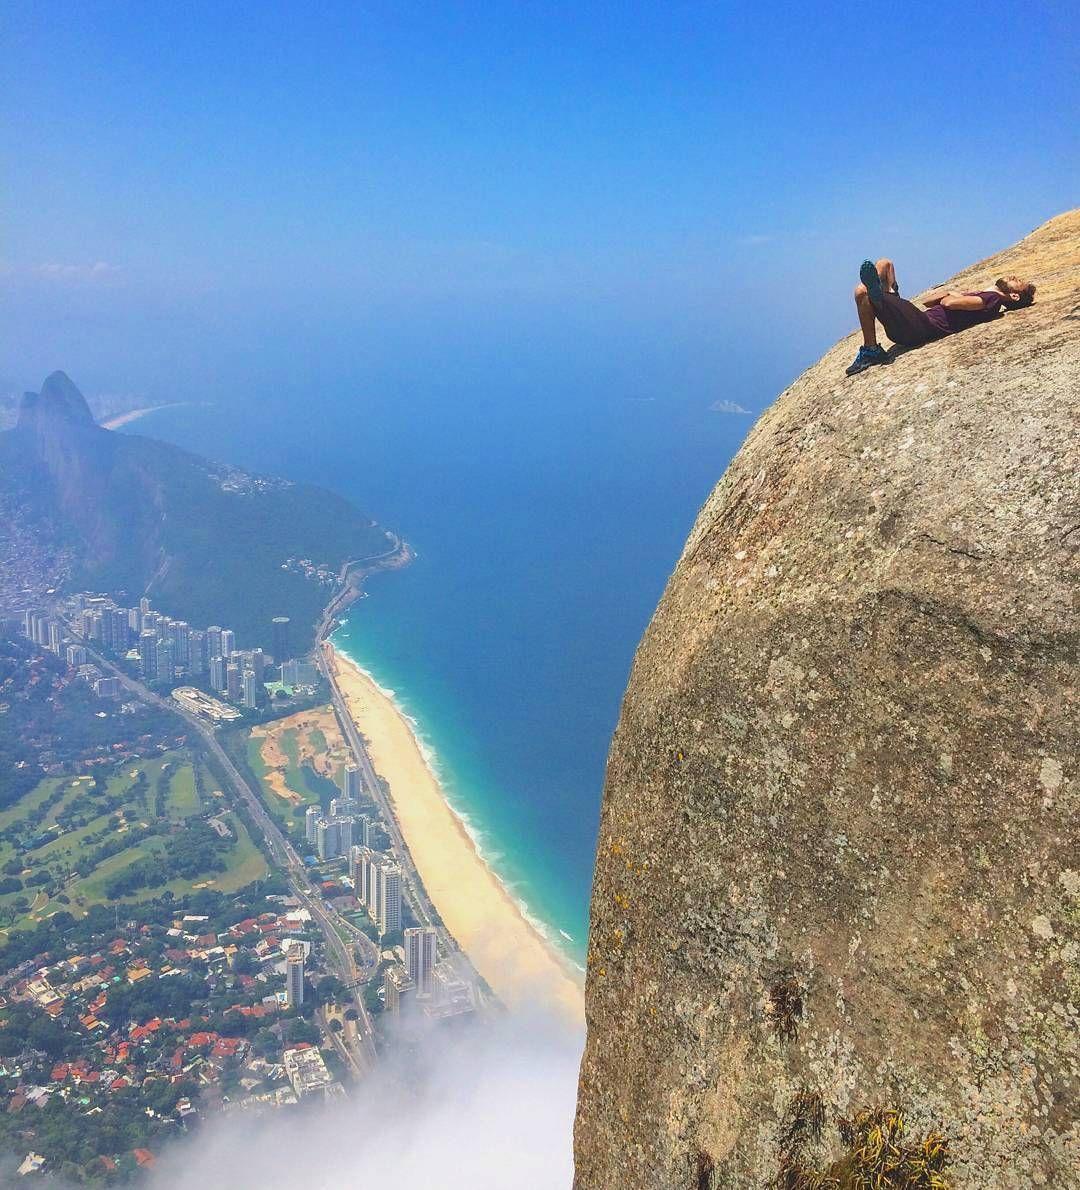 Pedra da Gávea, Rio de Janeiro, Brazil – Most Beautiful Picture